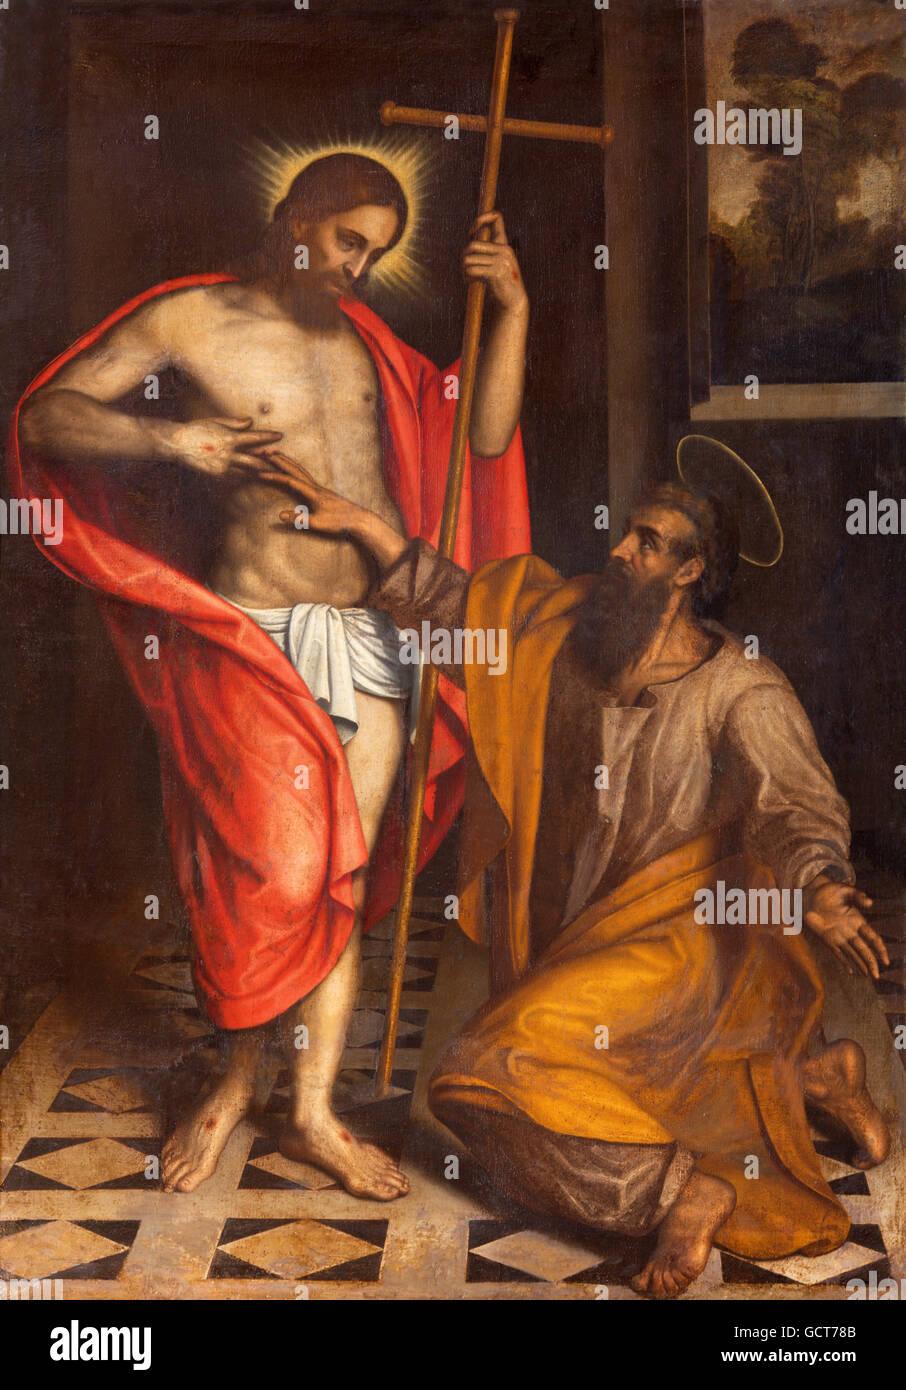 BRESCIA, Italien - 22. Mai 2016: Malerei der Zweifel von St. Thomas in der Kirche Chiesa di San Faustino e Giovita Stockbild